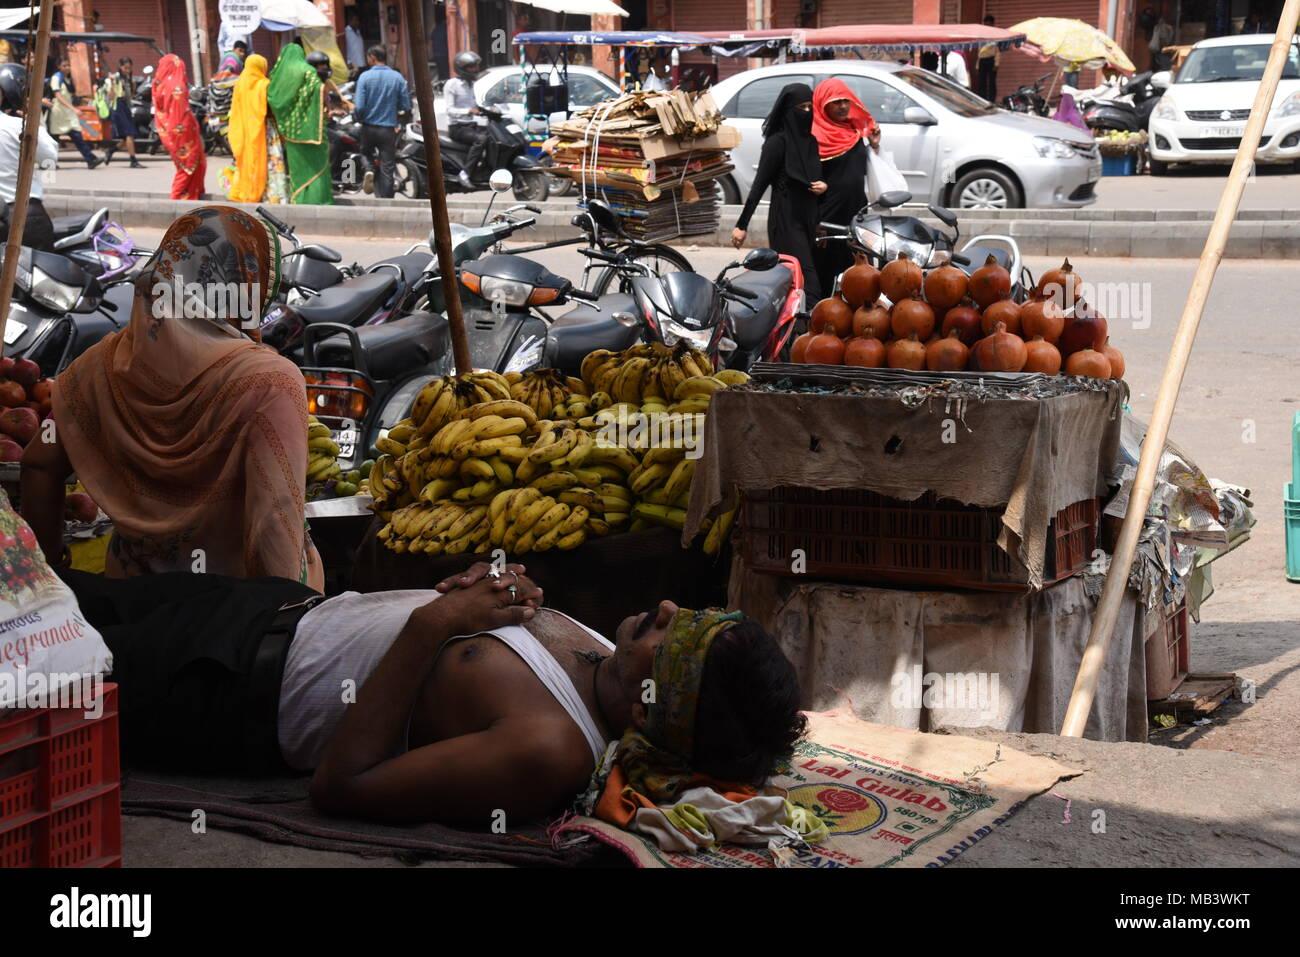 A street vendor takes a siesta break in the Jaipur, Rajasthan, India - Stock Image